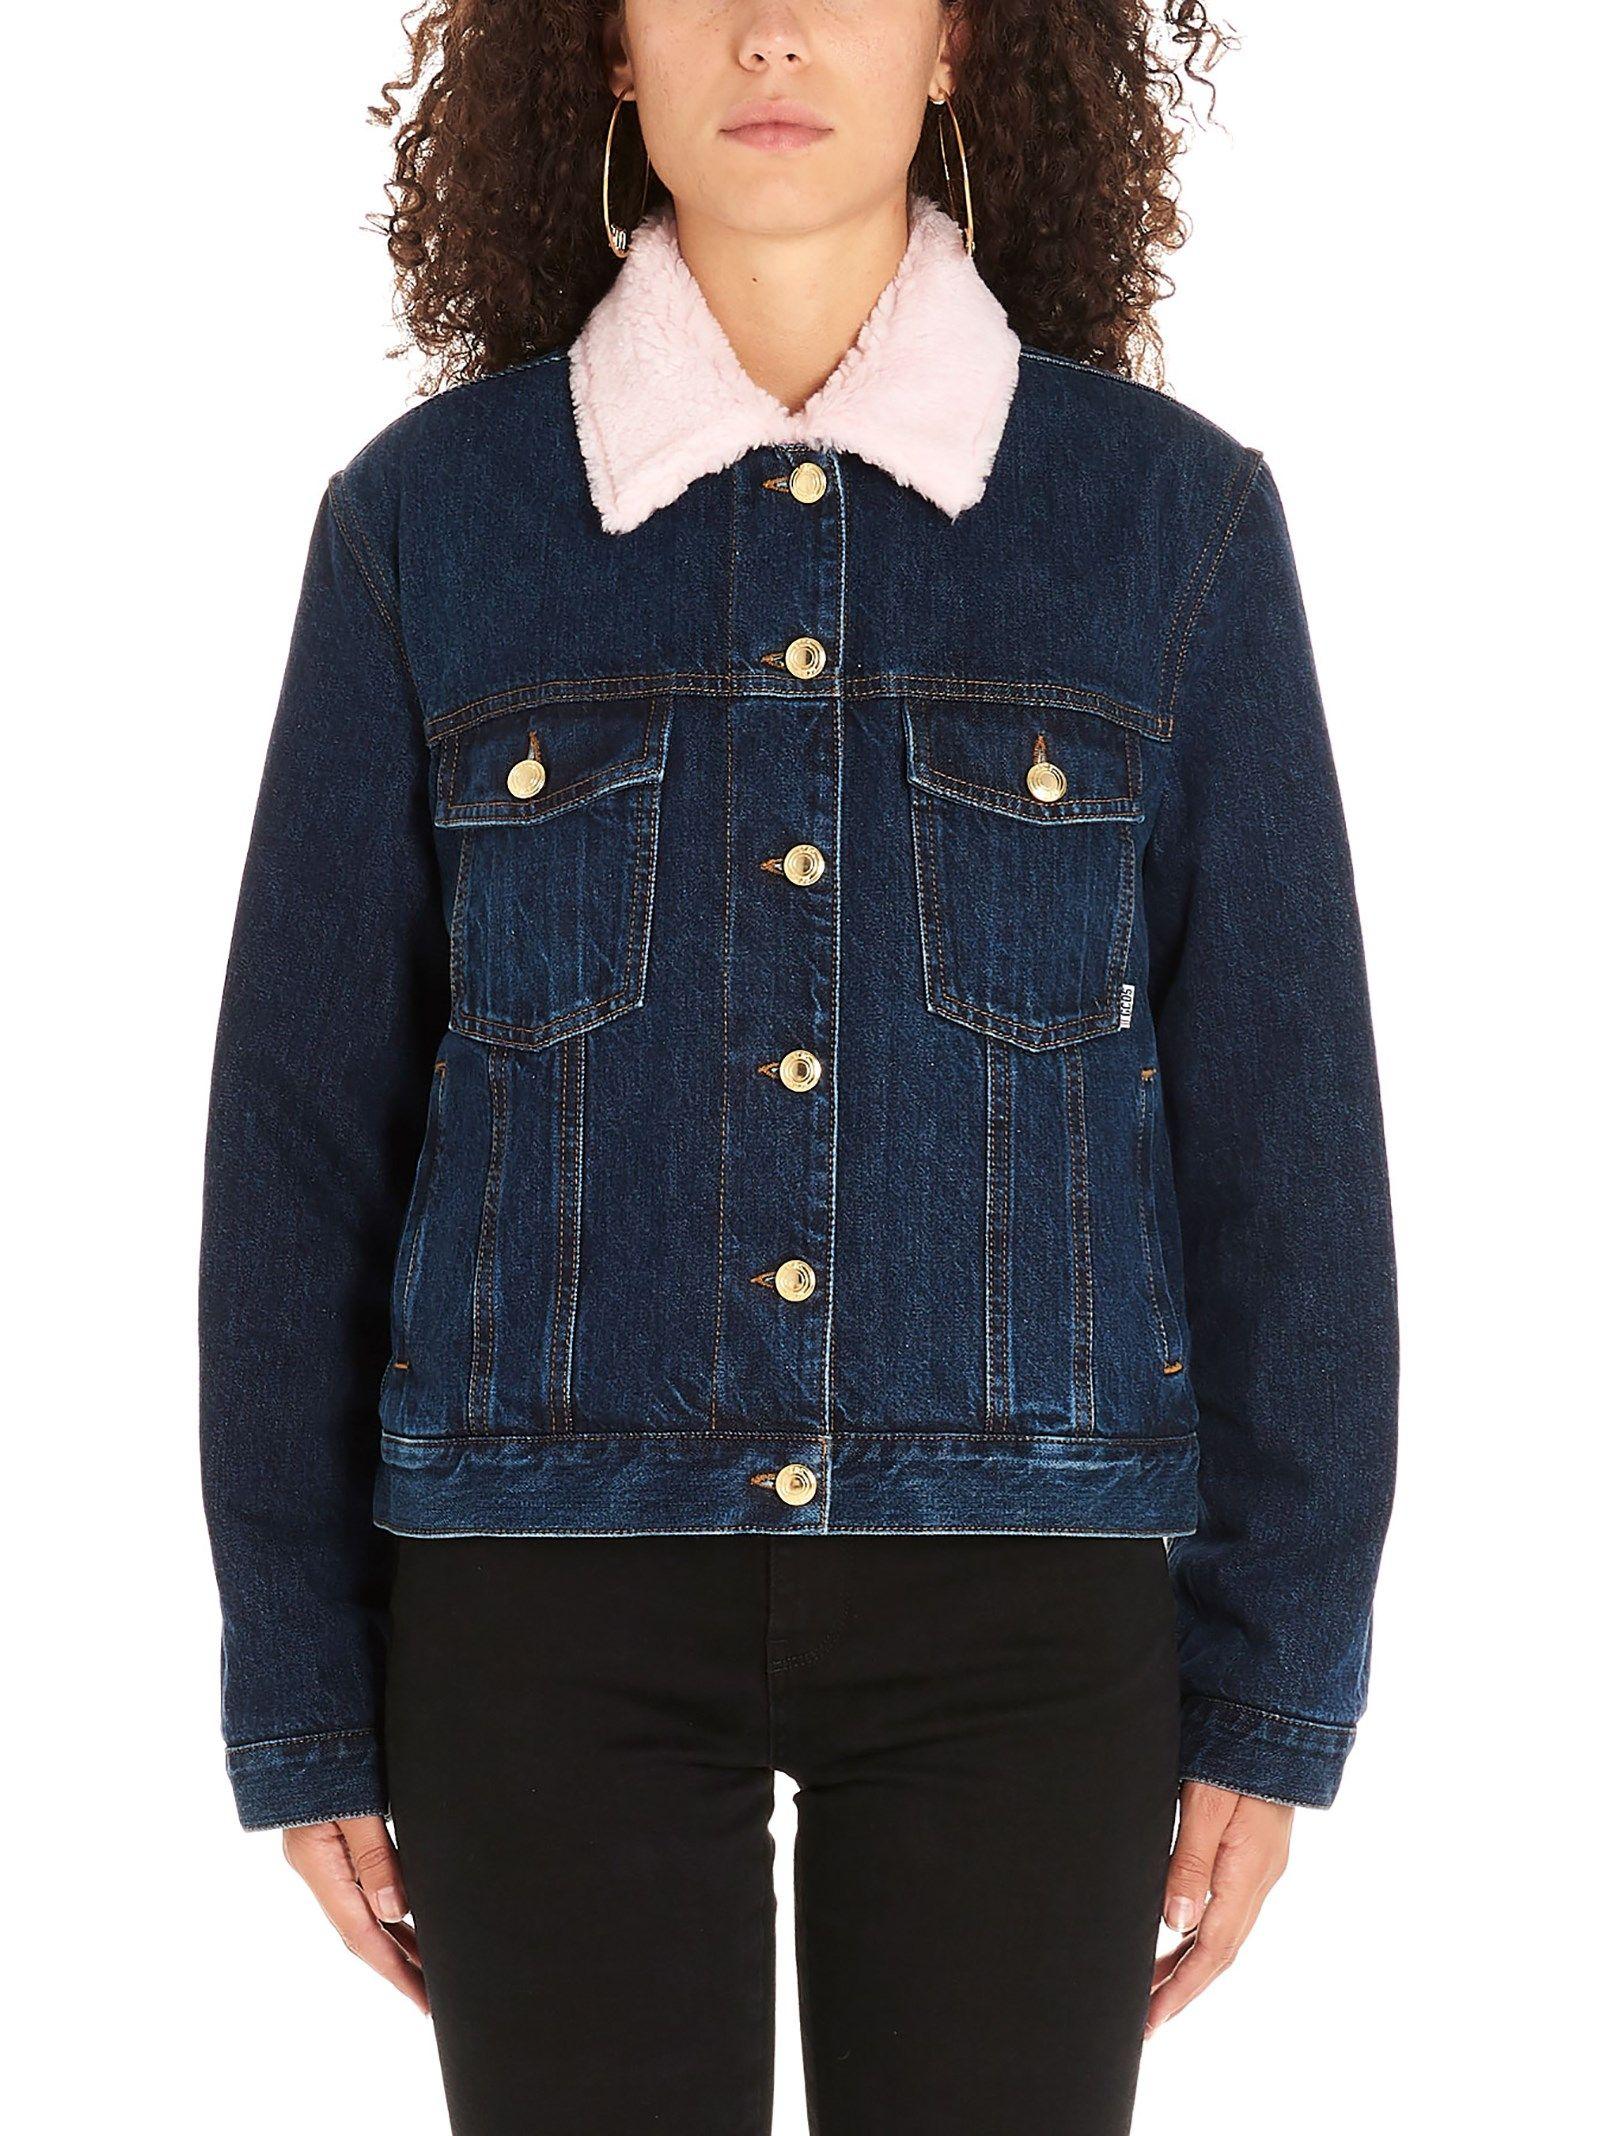 Gcds Blue Cotton Outerwear Jacket